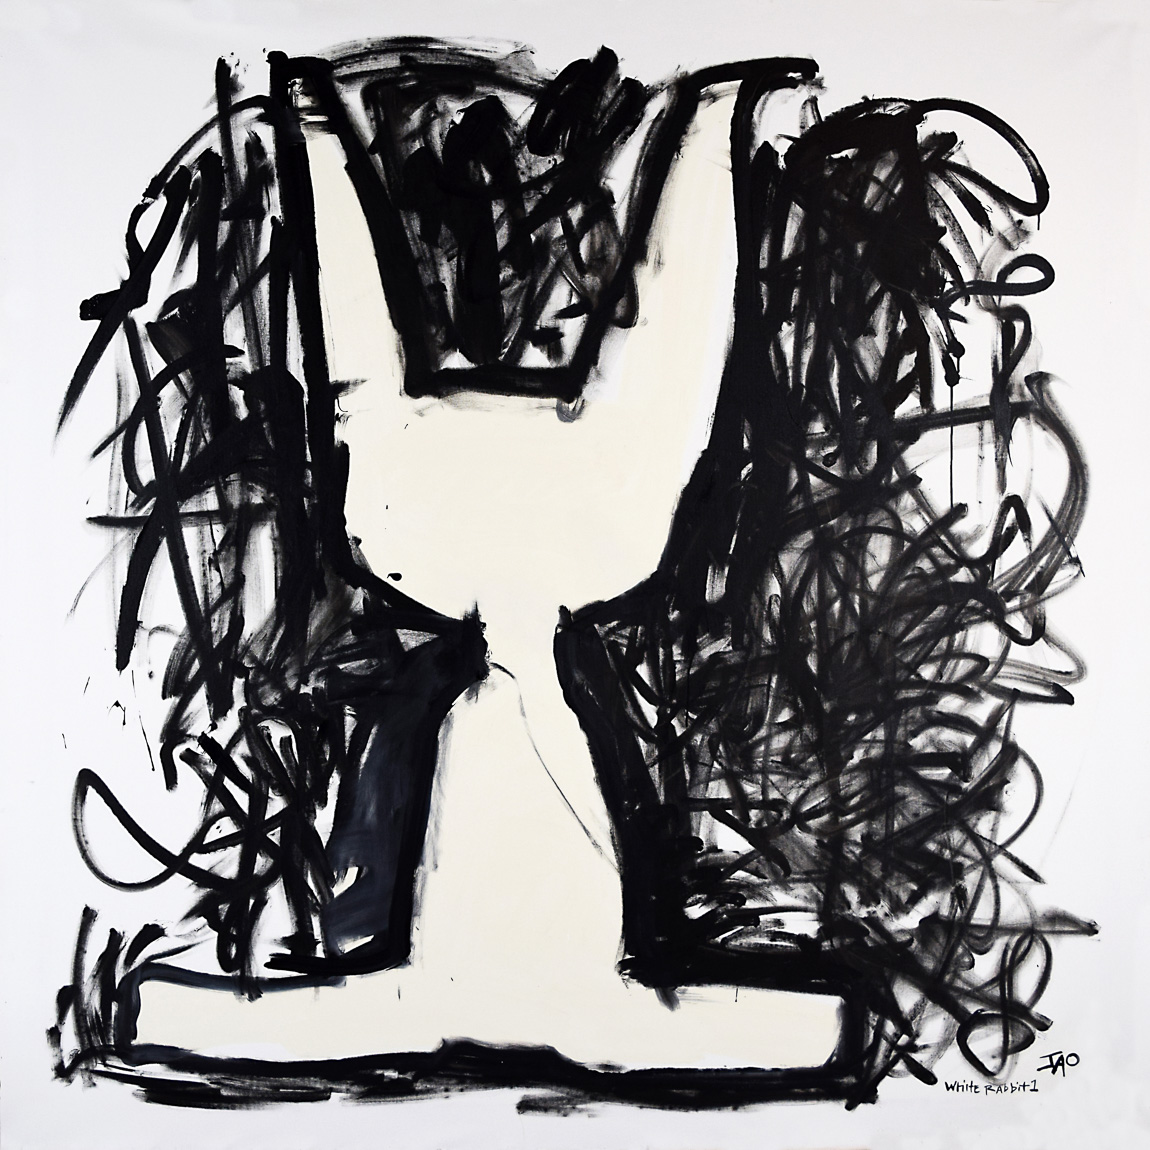 White Rabbit Quadtych Panel 1 by JAO